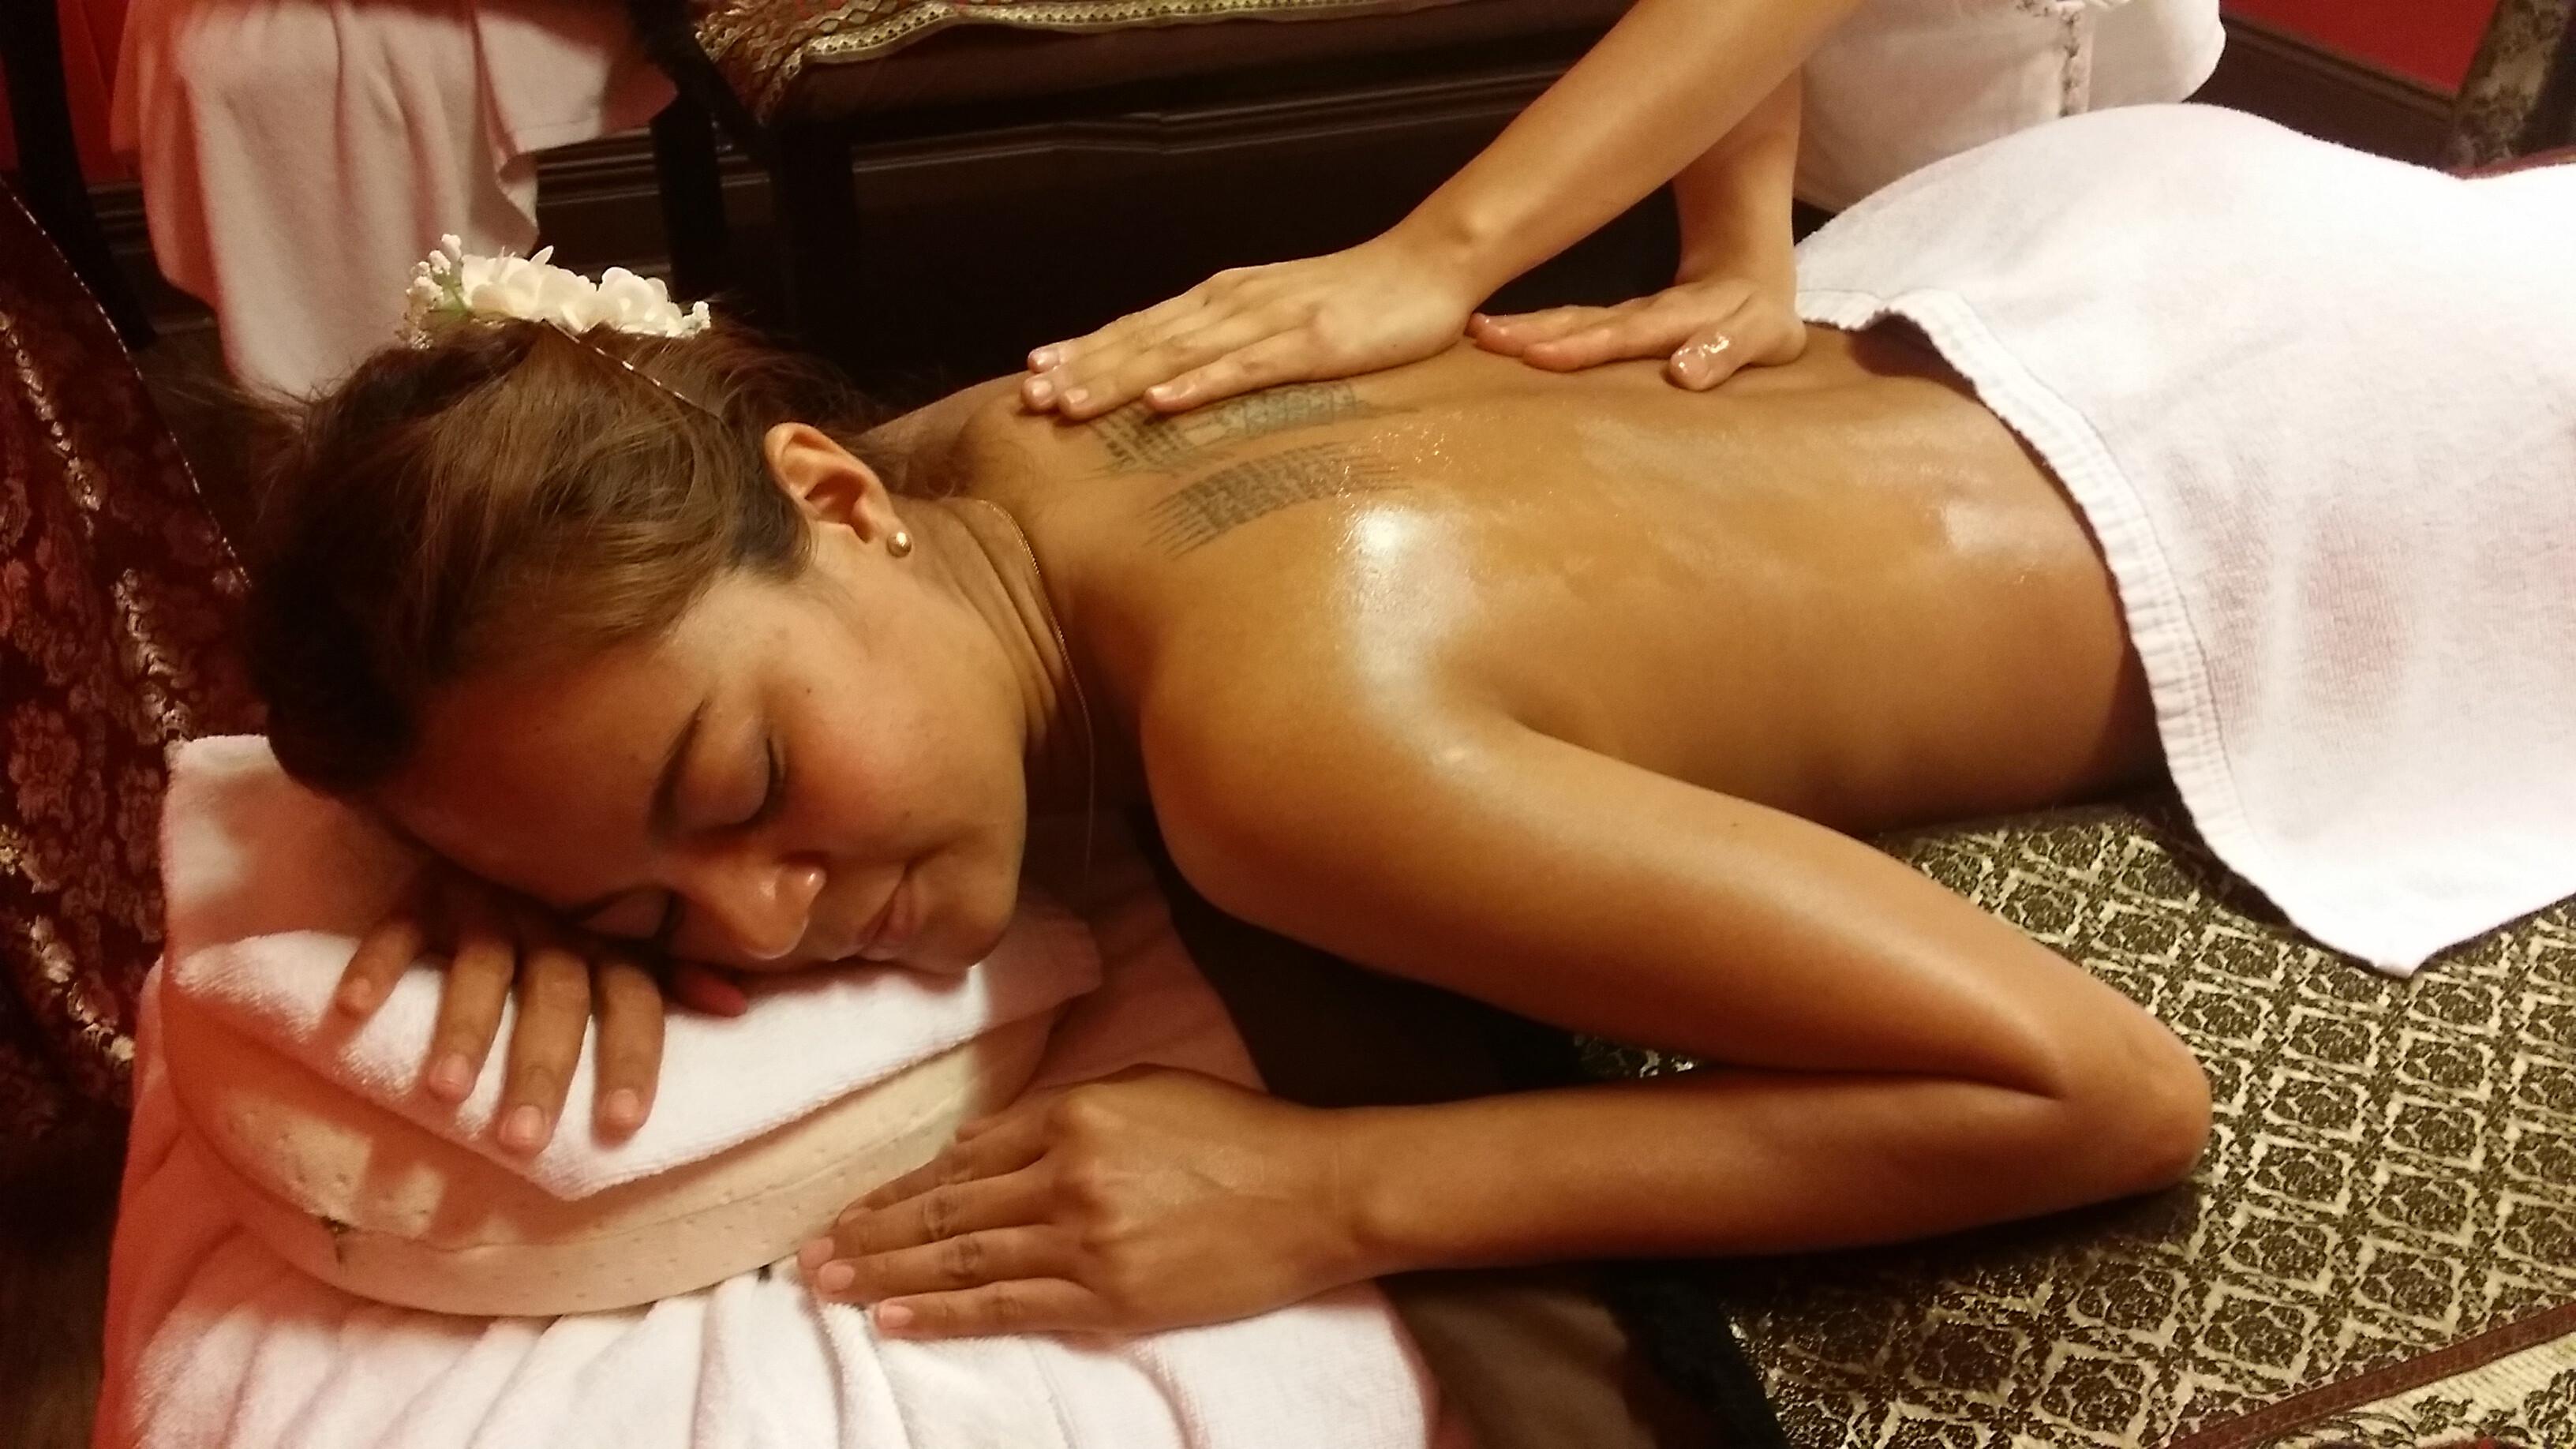 Gratis Porr Mobilen Massage Skövde